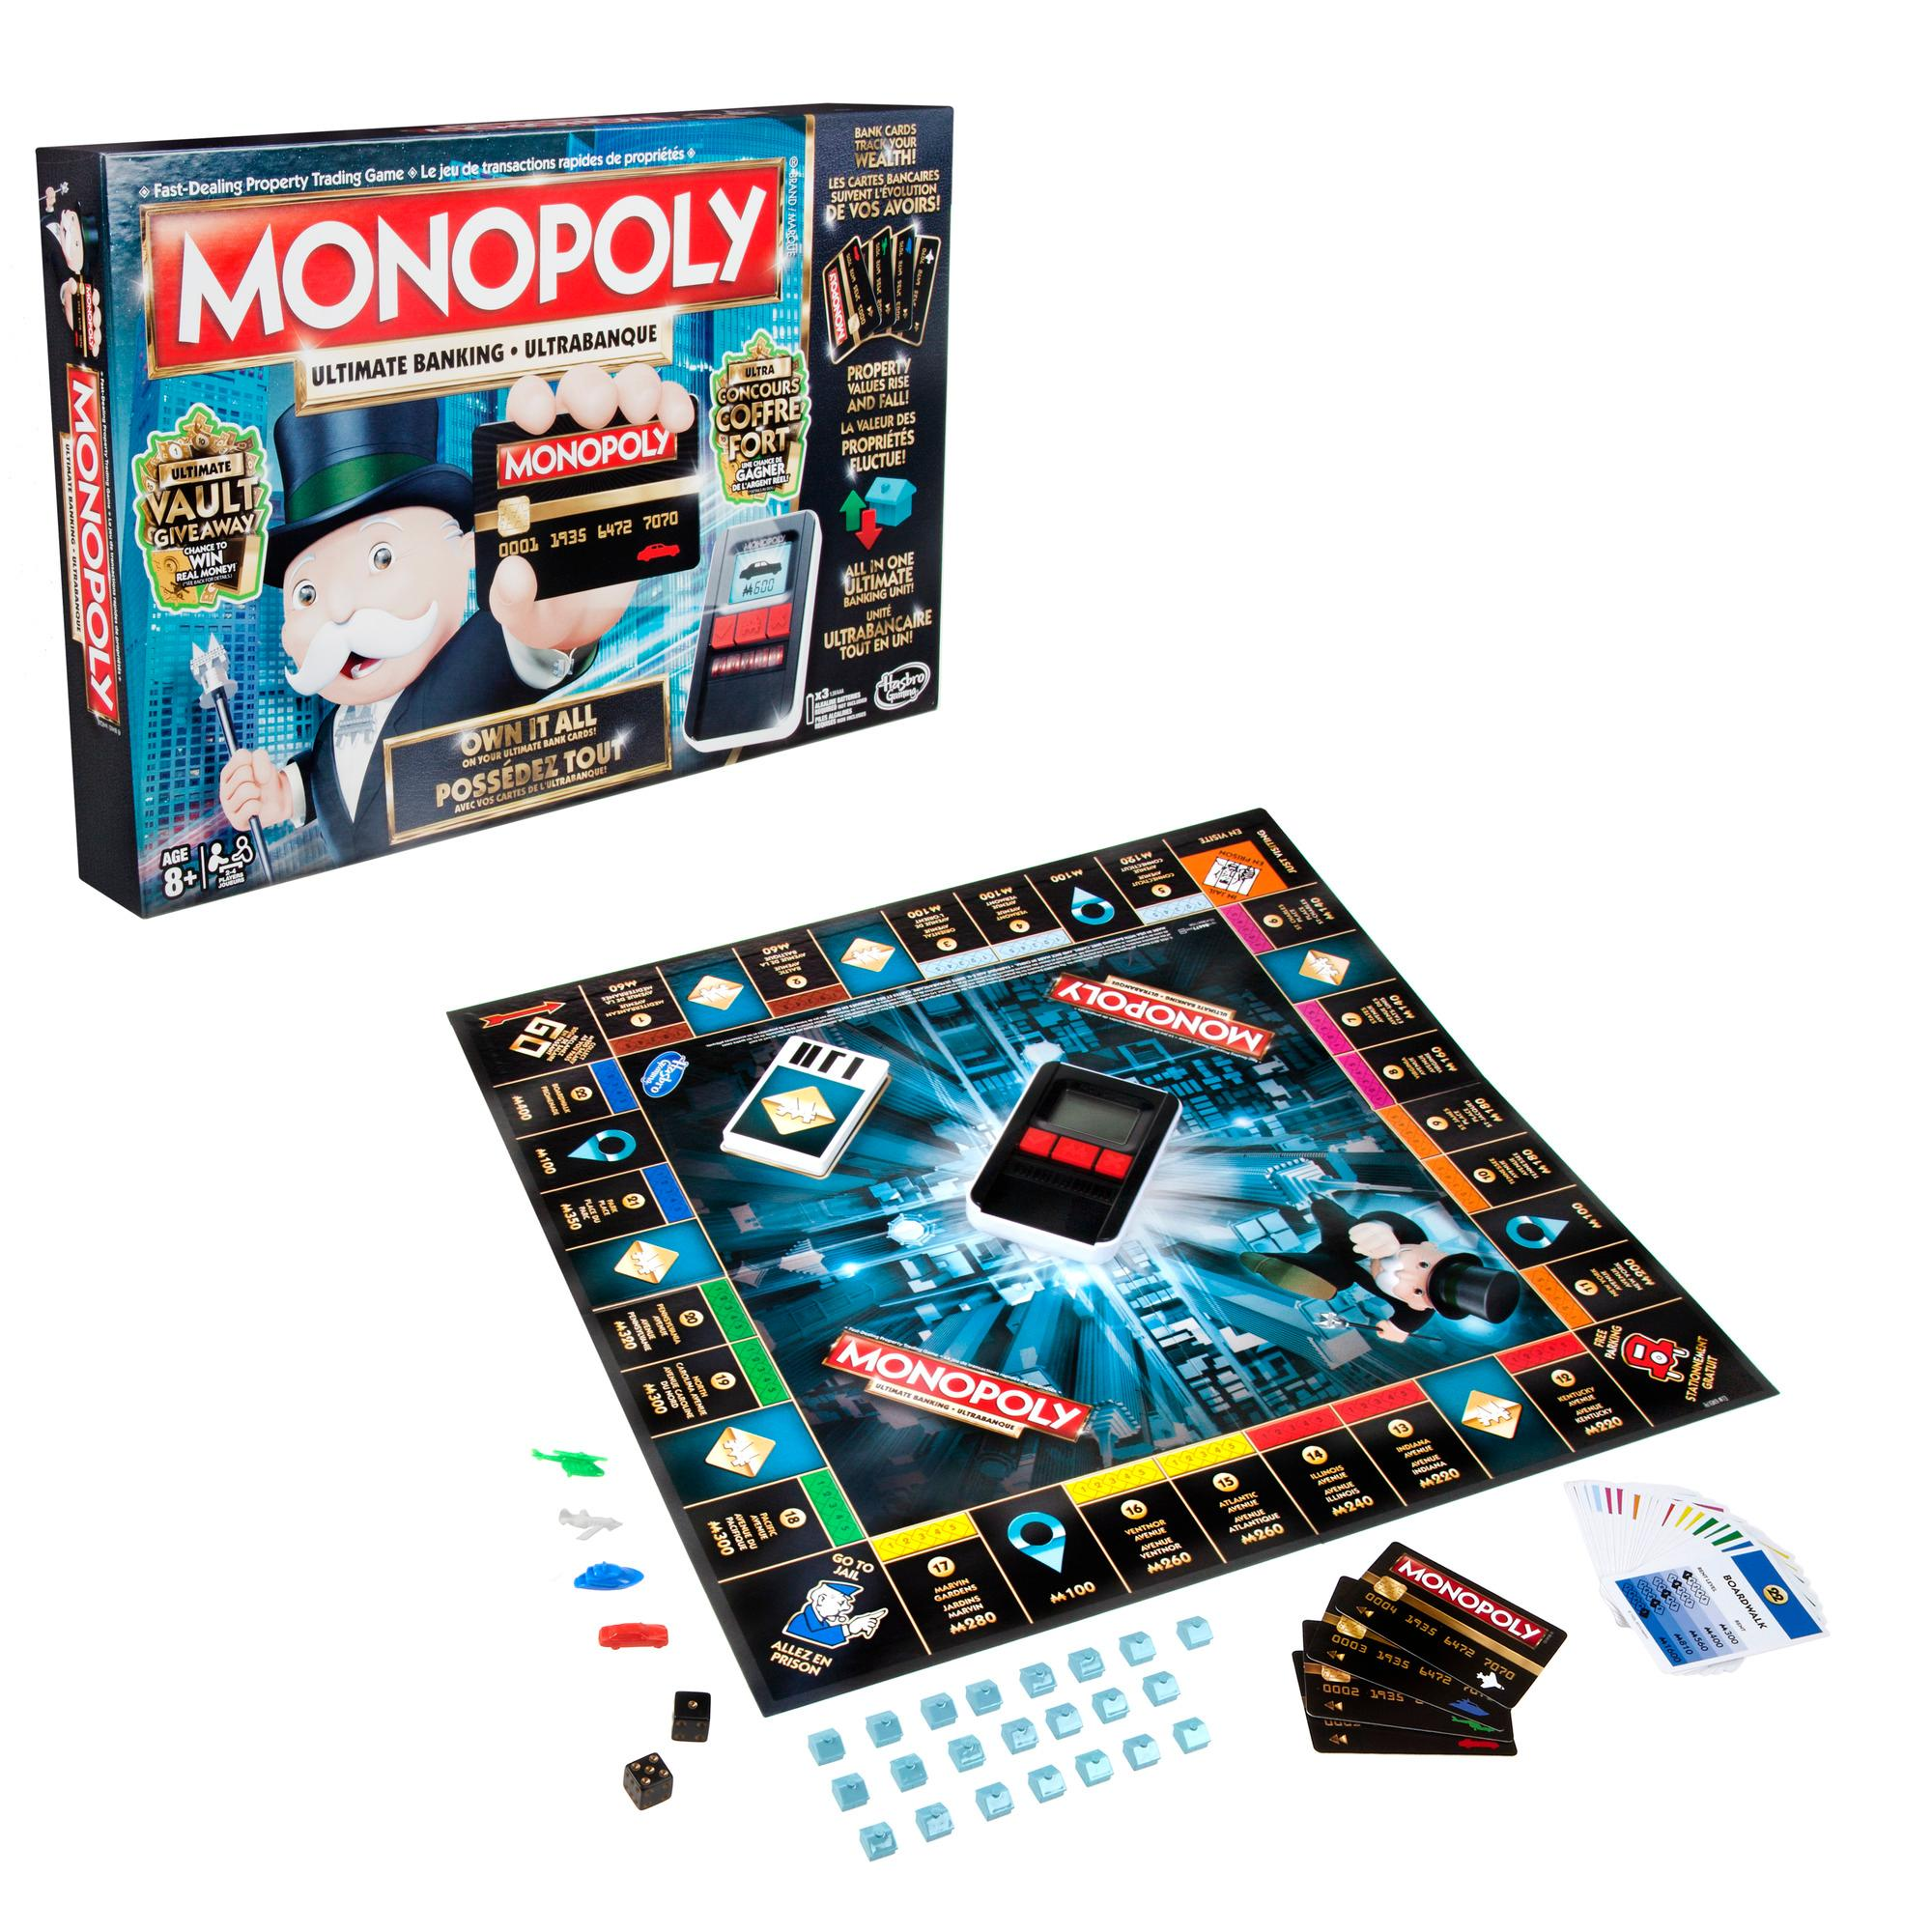 Monopoly Ultimate Banking, Board Games - Amazon Canada